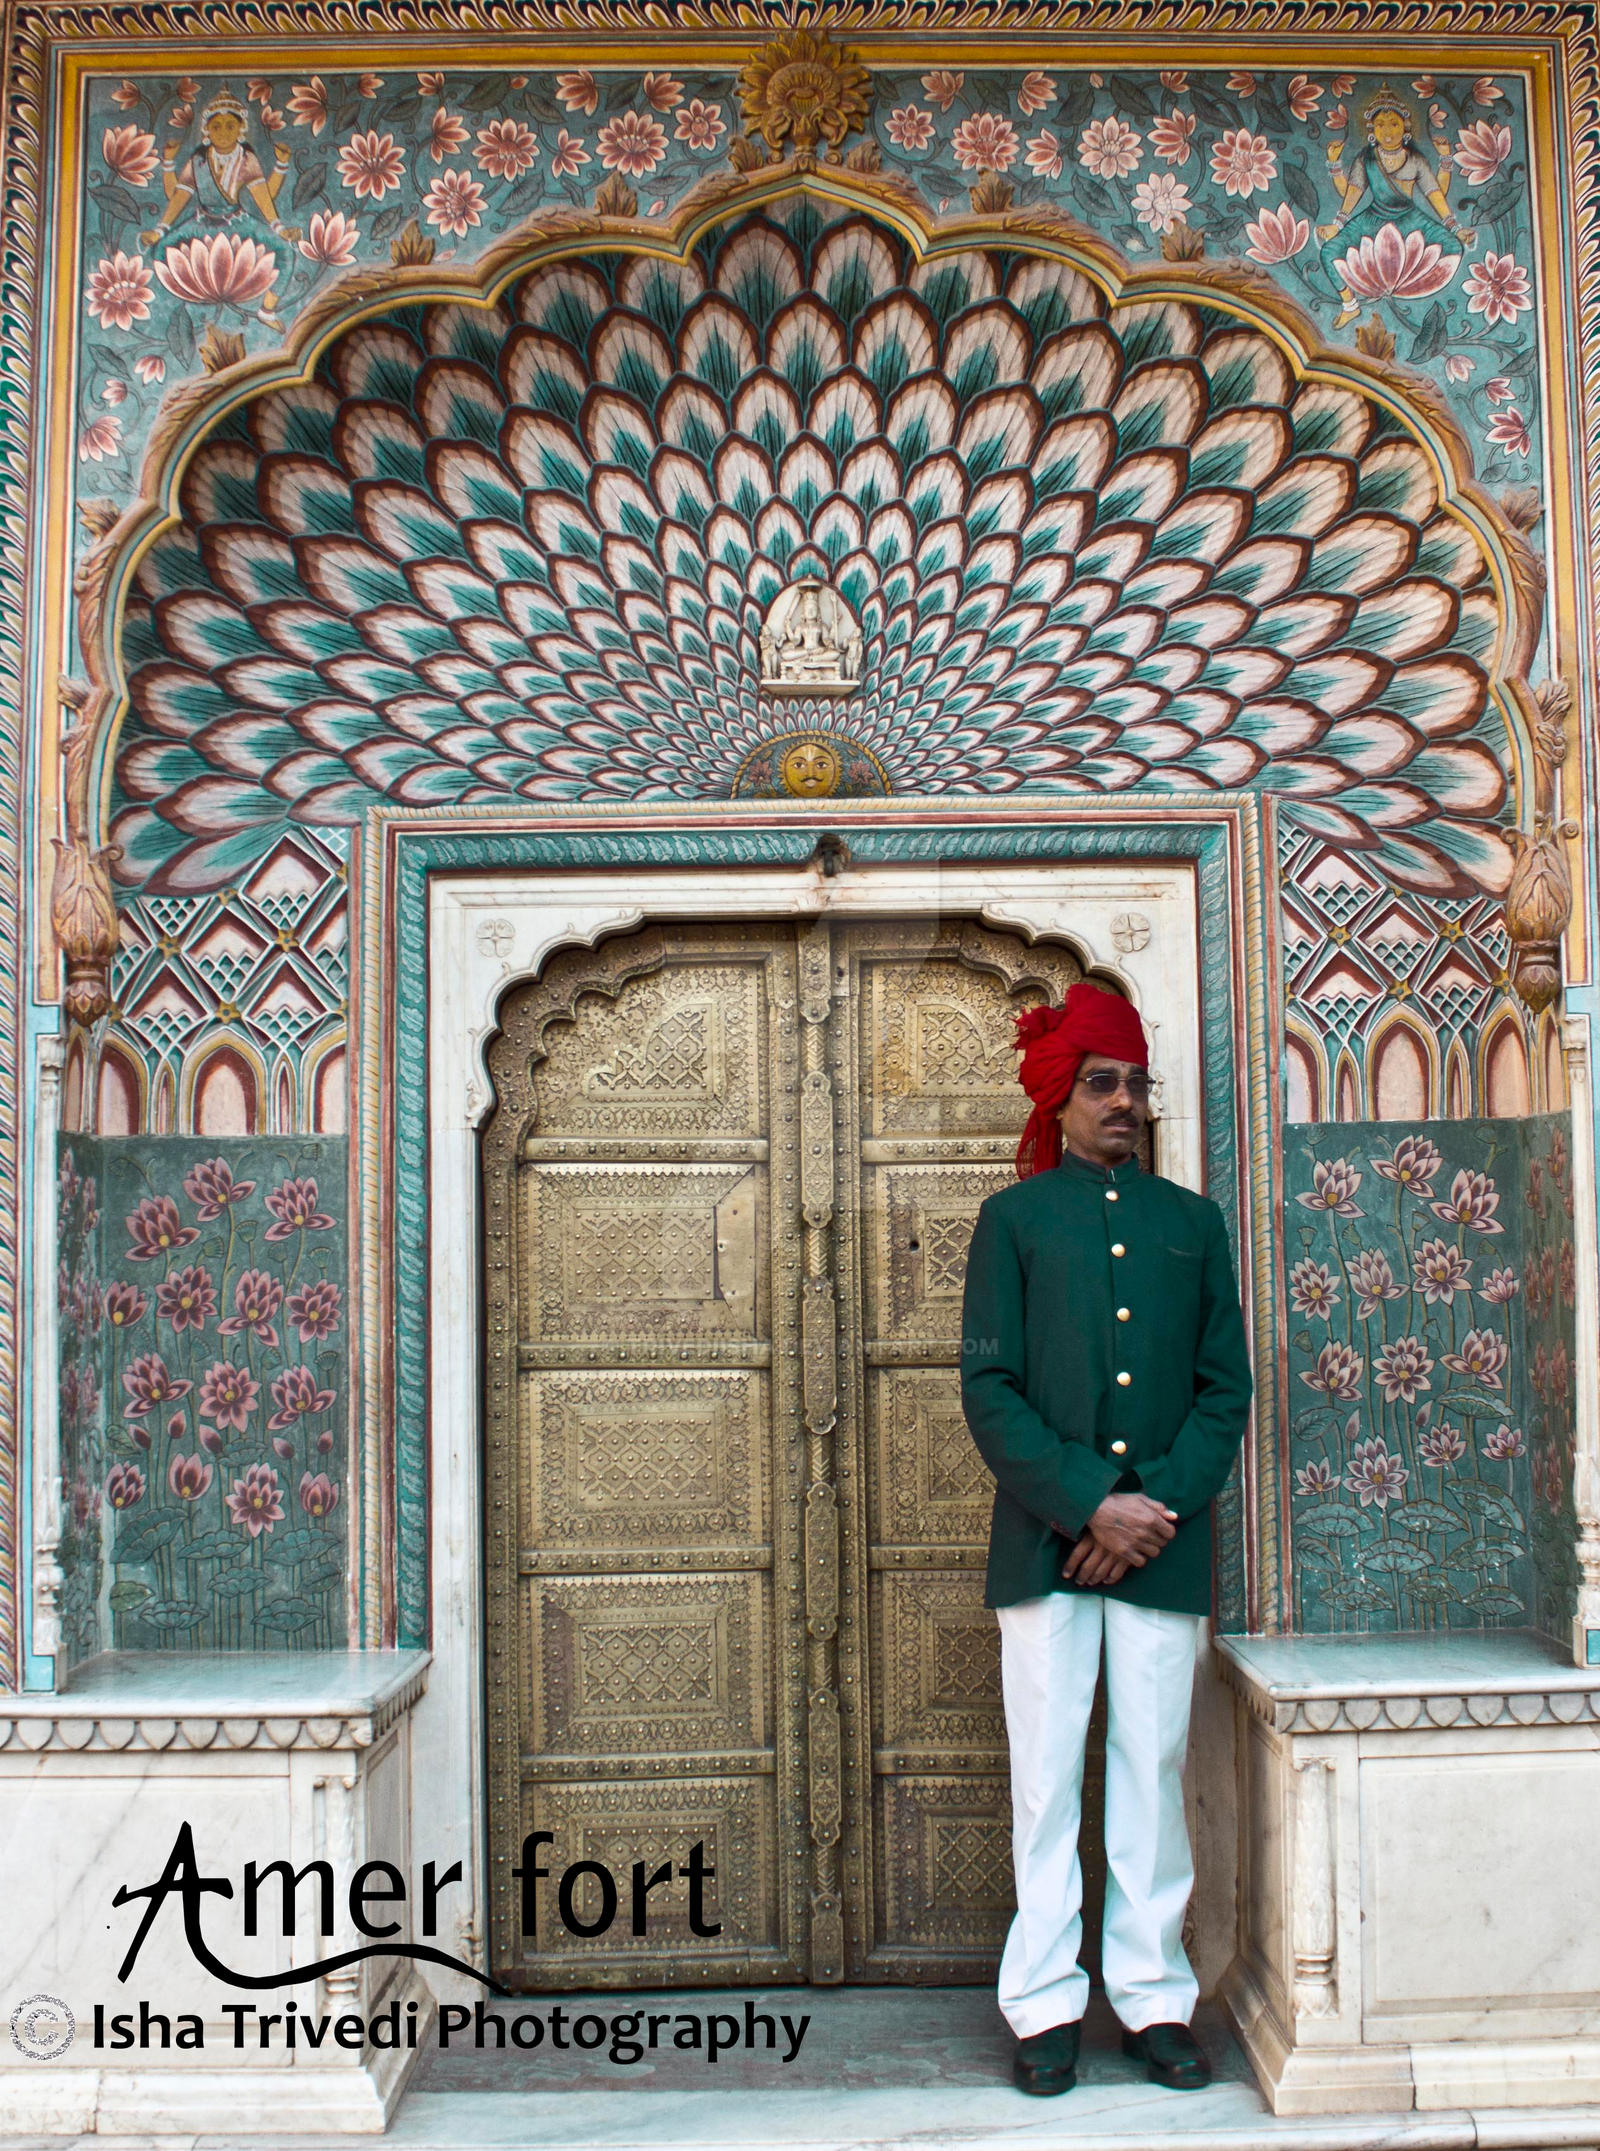 The Darbaan - clicked by Isha Trivedi by trivediisha